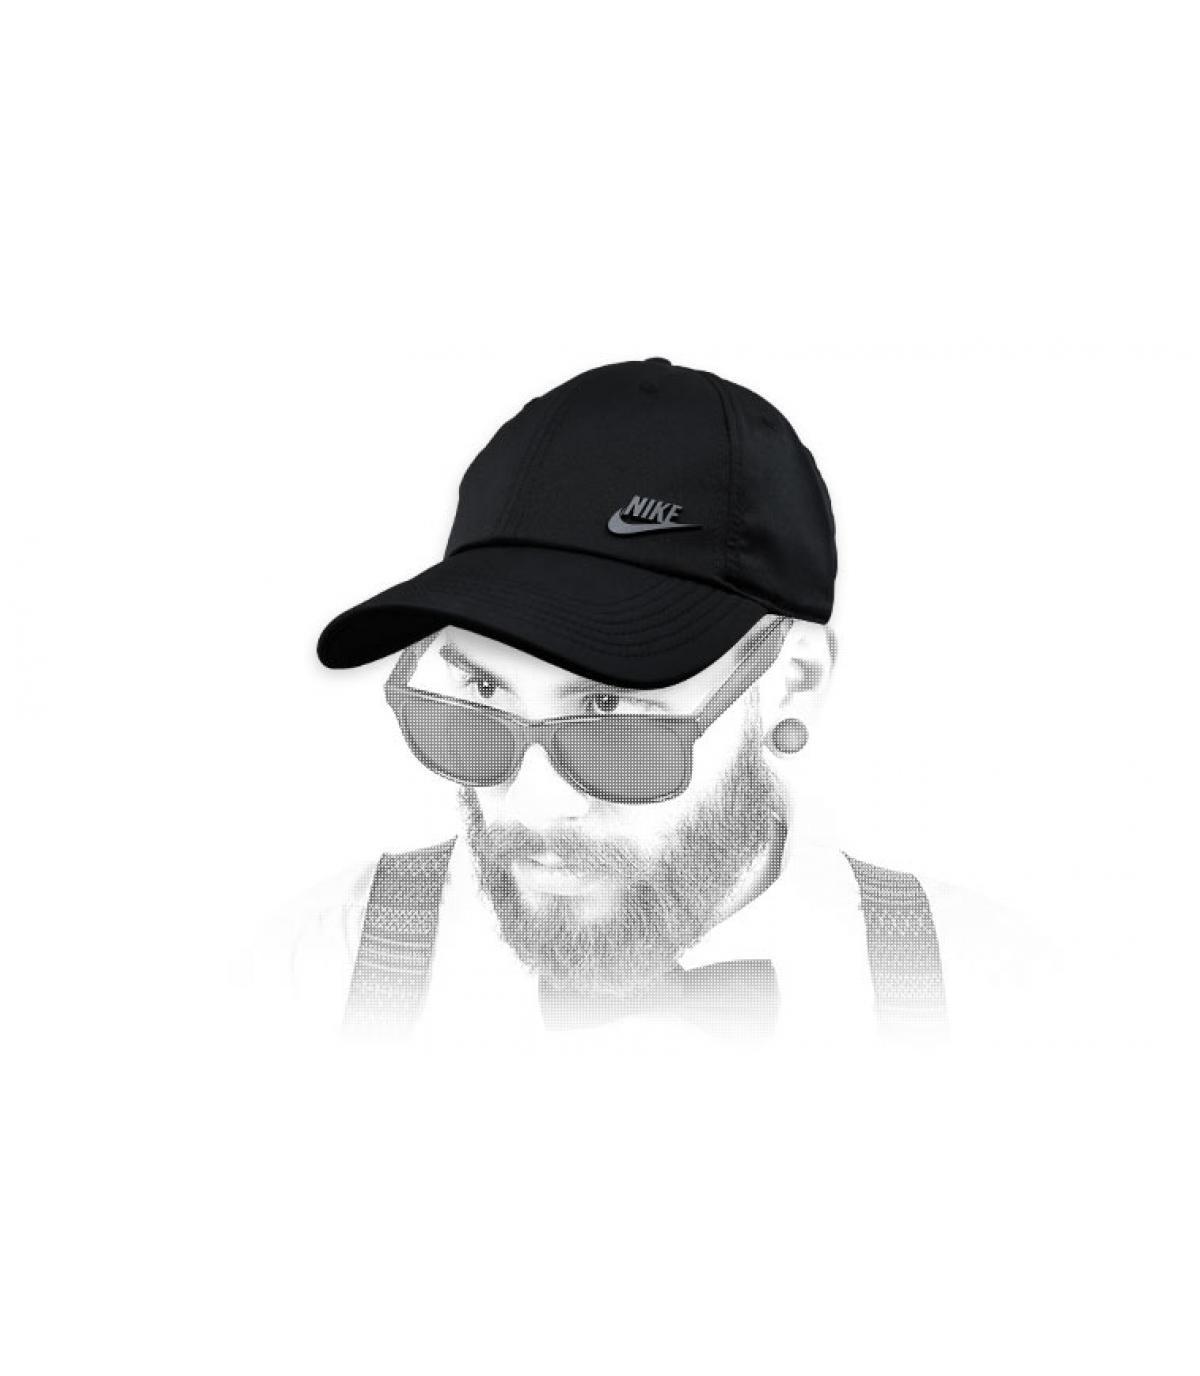 casquette Nike noir logo